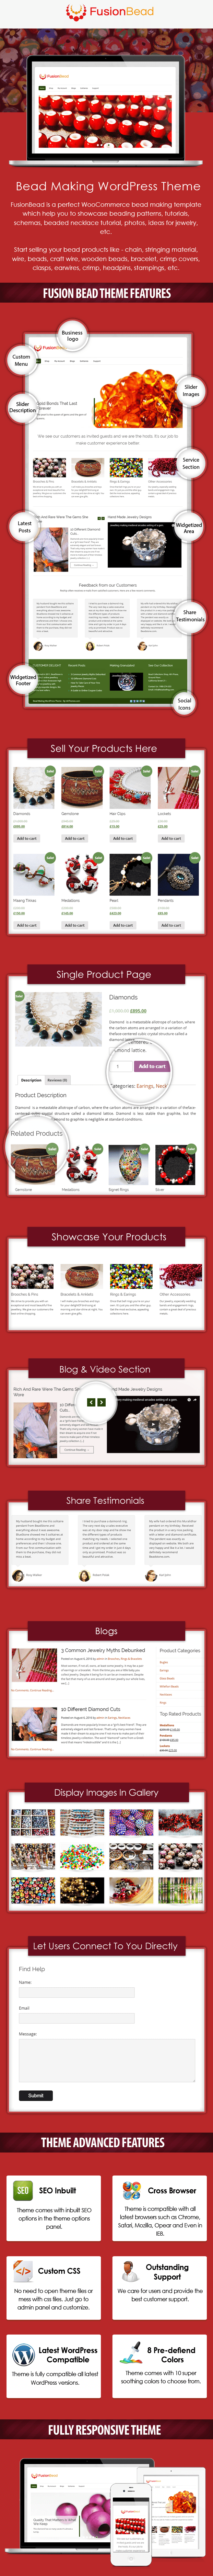 Bead Making WordPress Theme Sales Page Preview